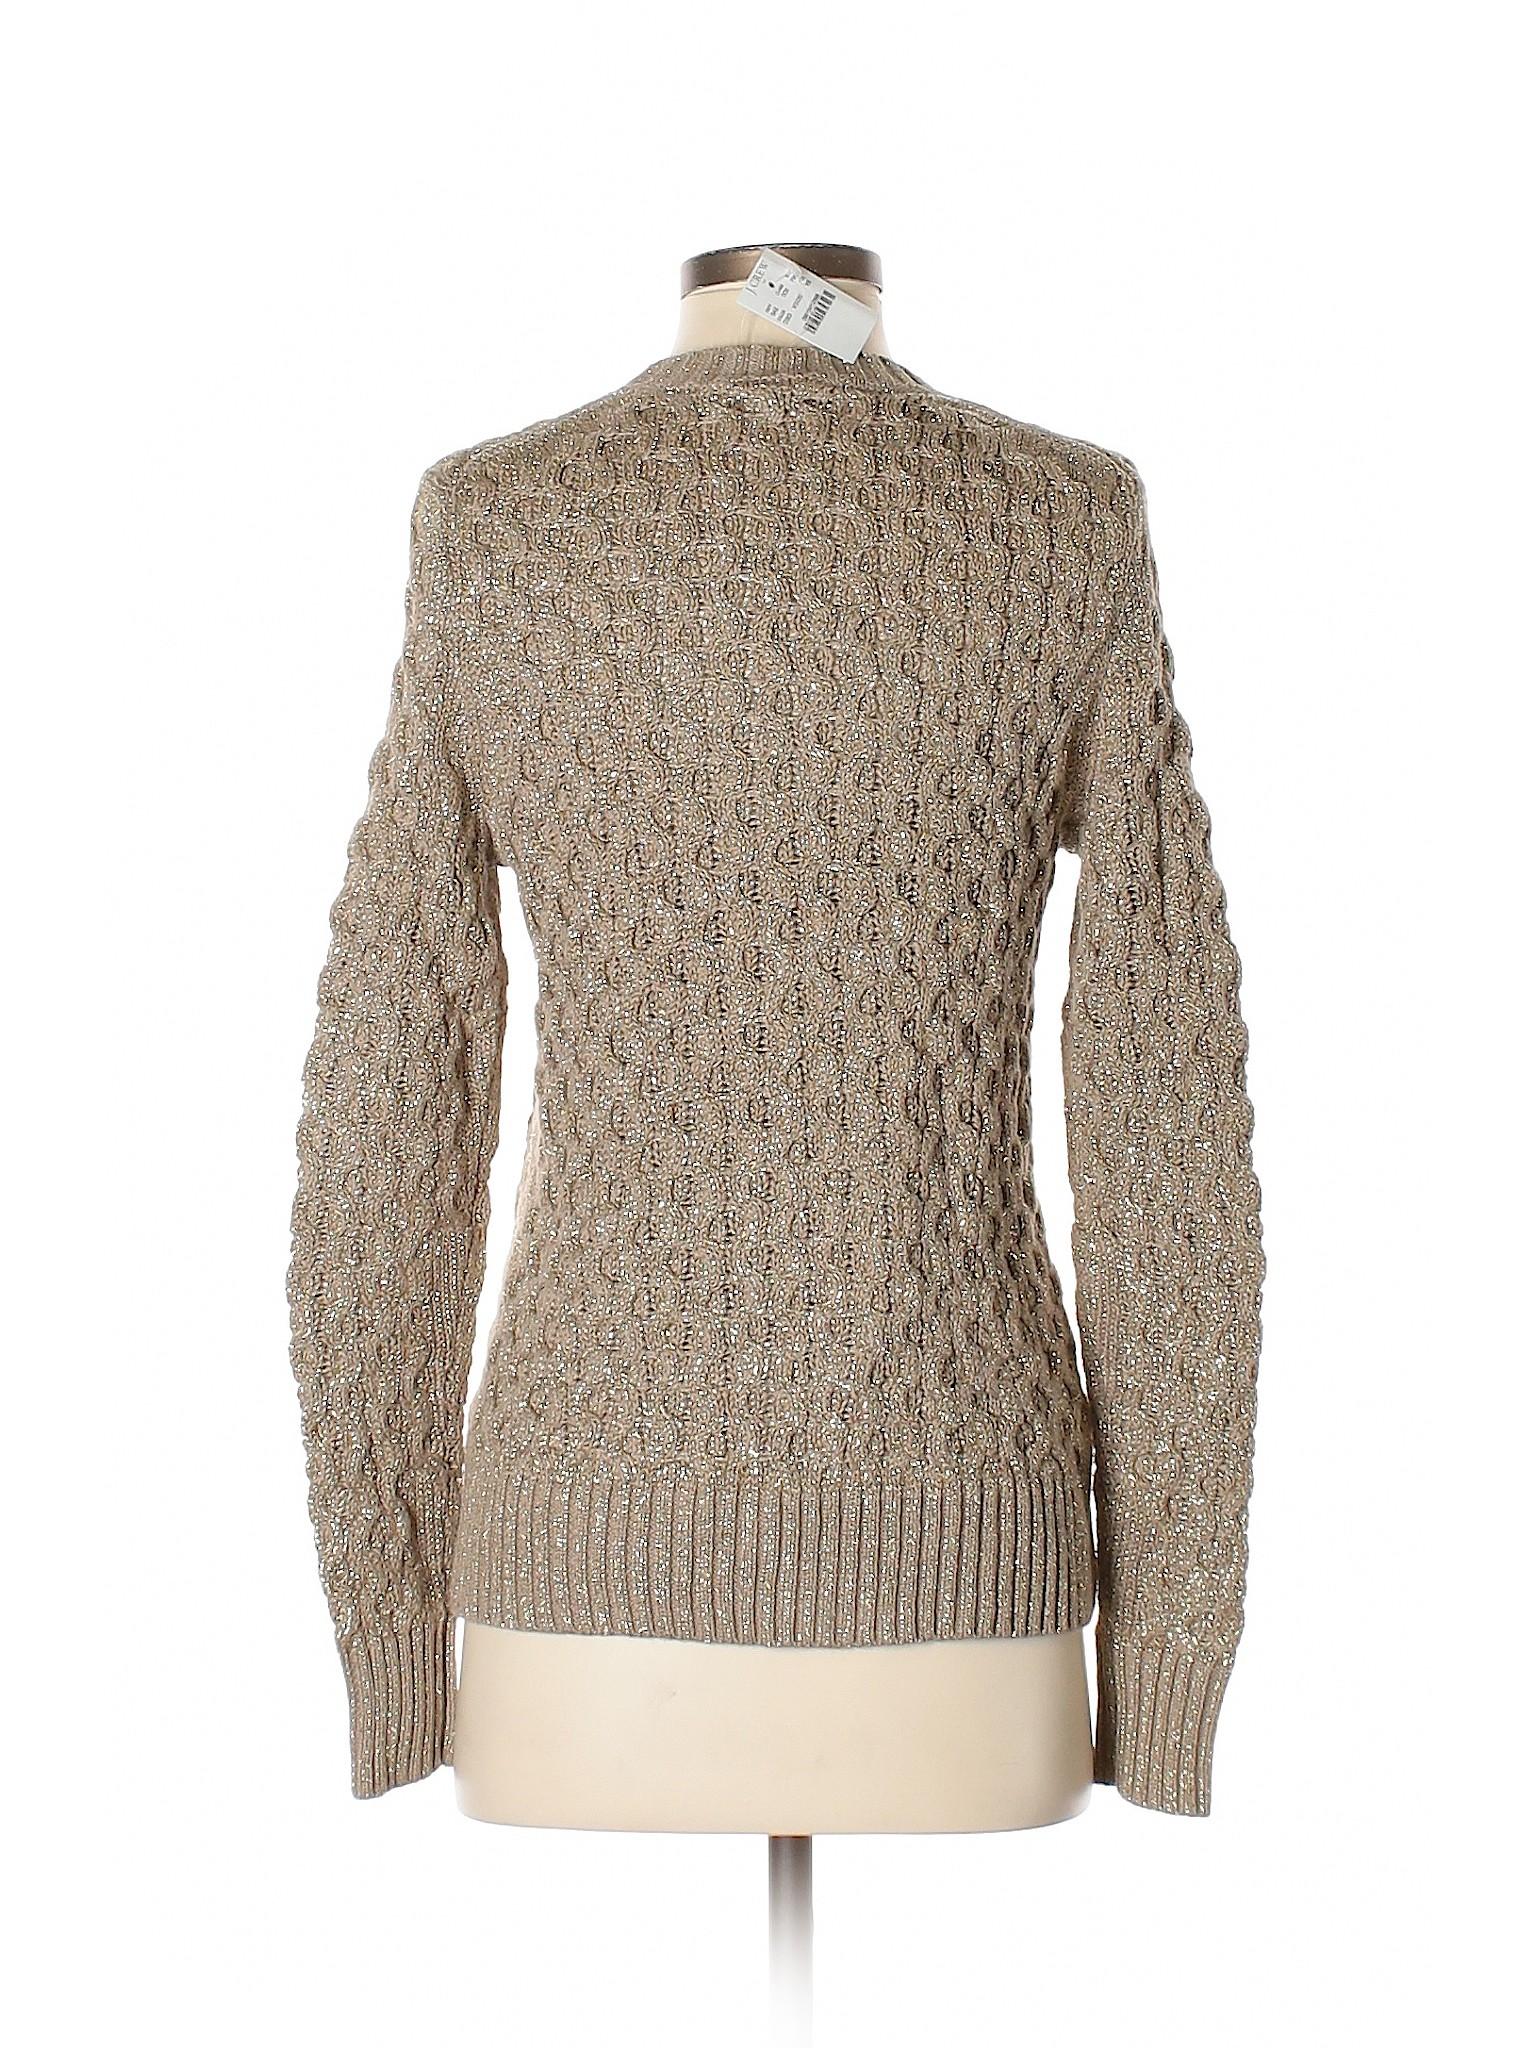 Crew J Crew Pullover Boutique Pullover Sweater Boutique J dXqw8BIw